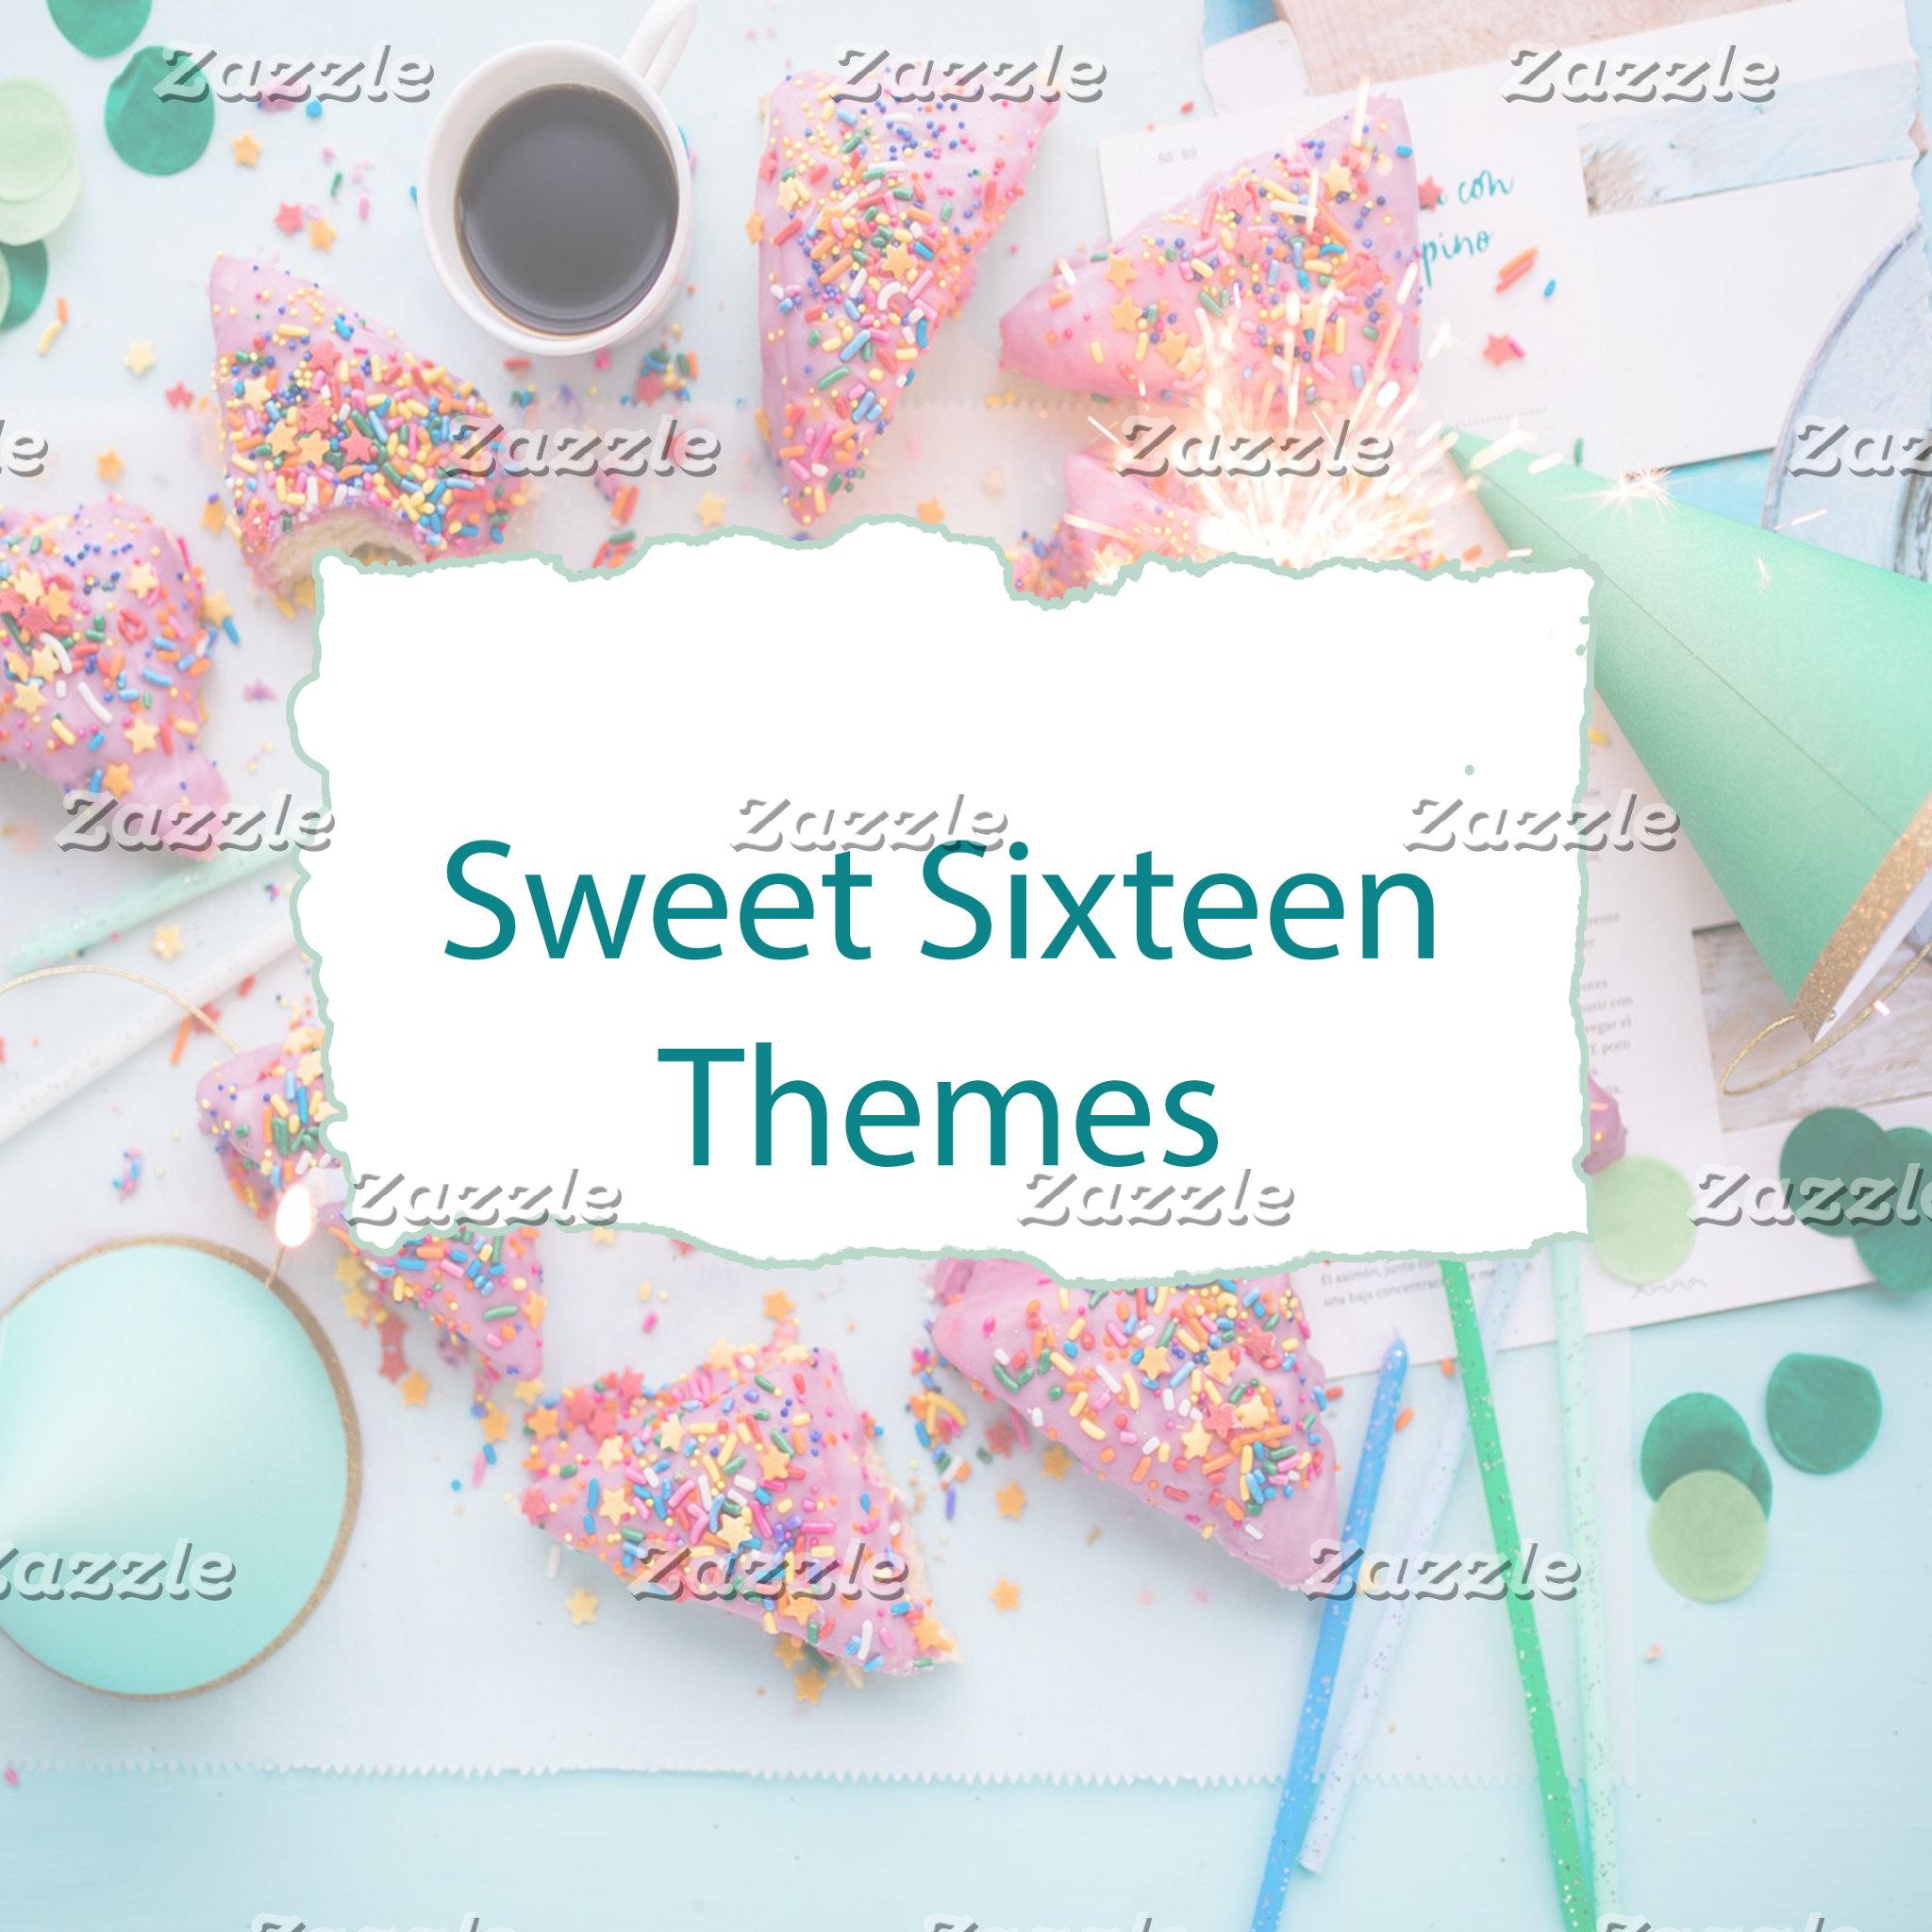 Sweet Sixteen Themes